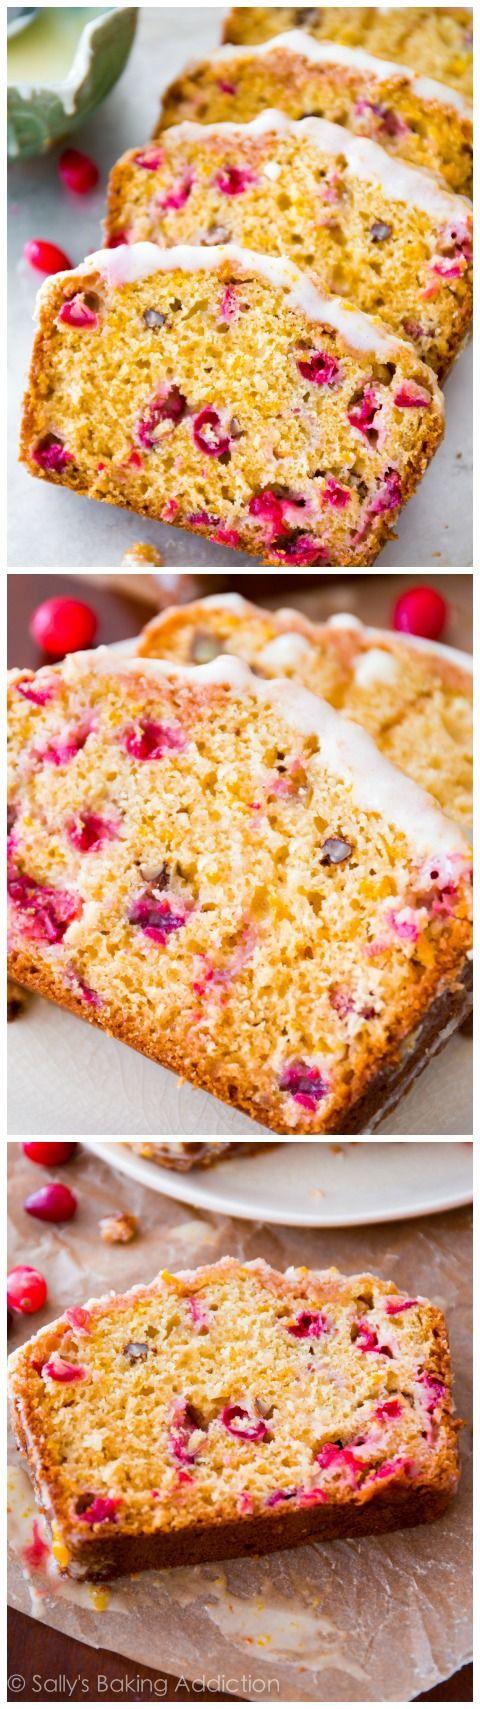 ... orange cranberry bread. Complete with streusel and sweet orange glaze